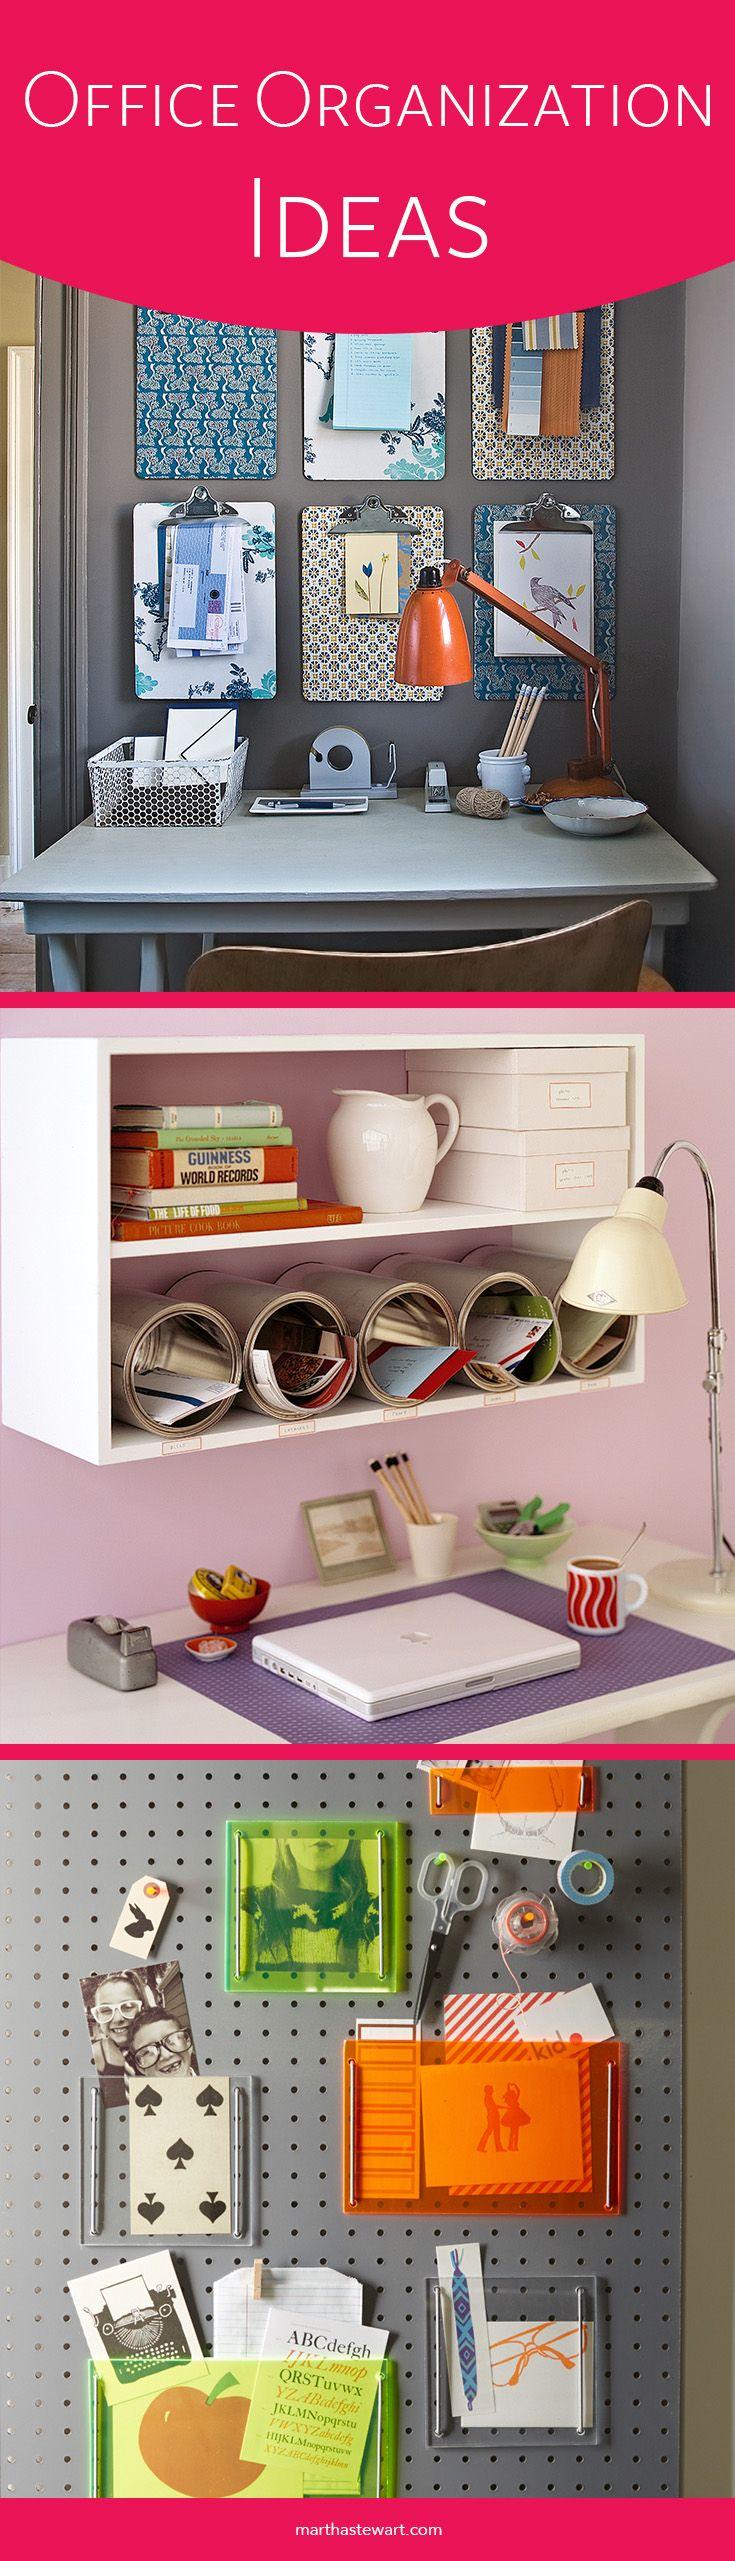 Office Organization Ideas | Martha Stewart Living